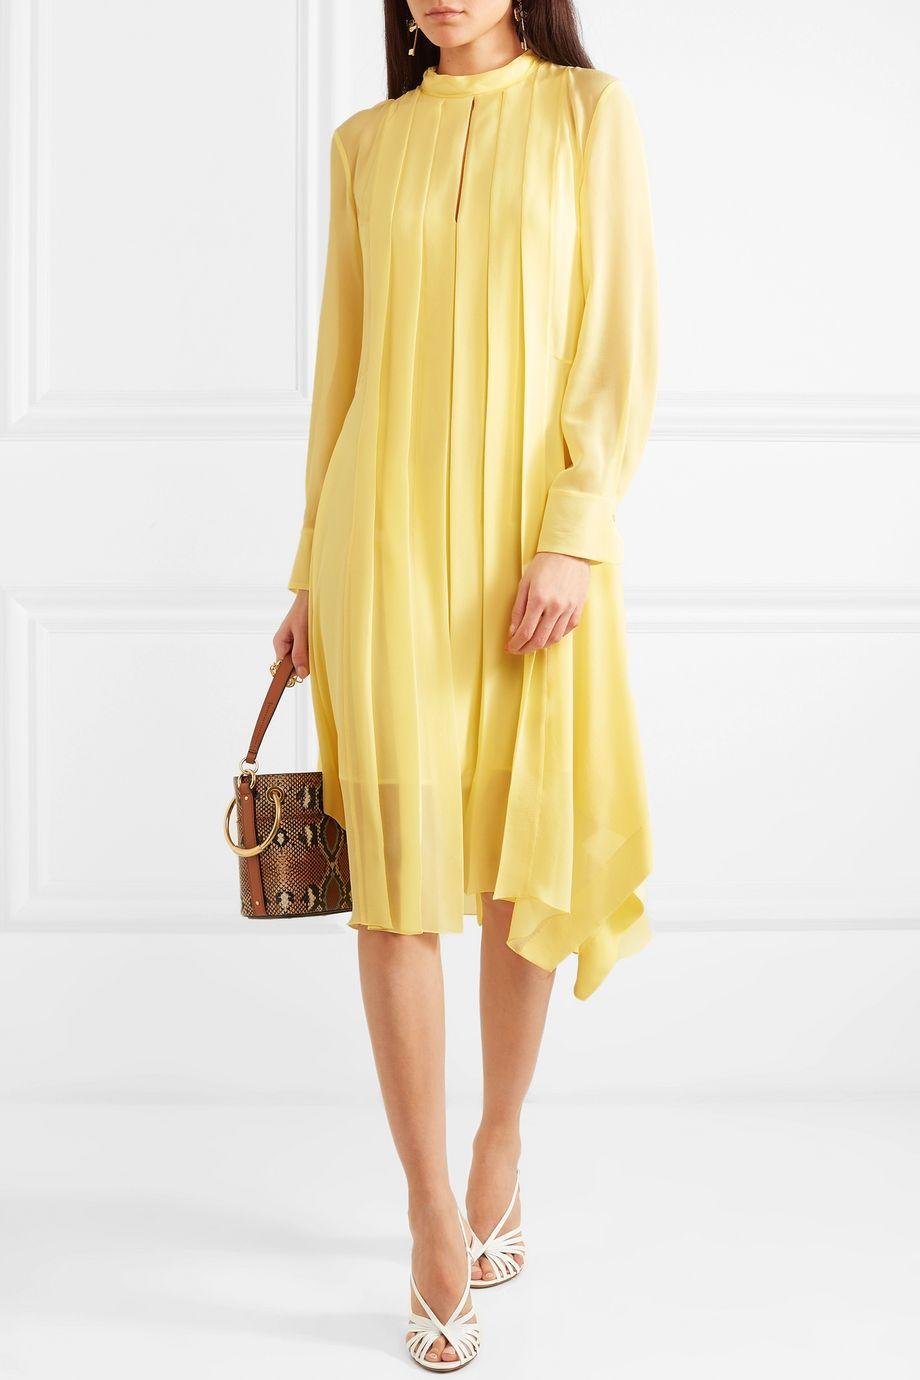 Chloé Pleated silk-chiffon dress